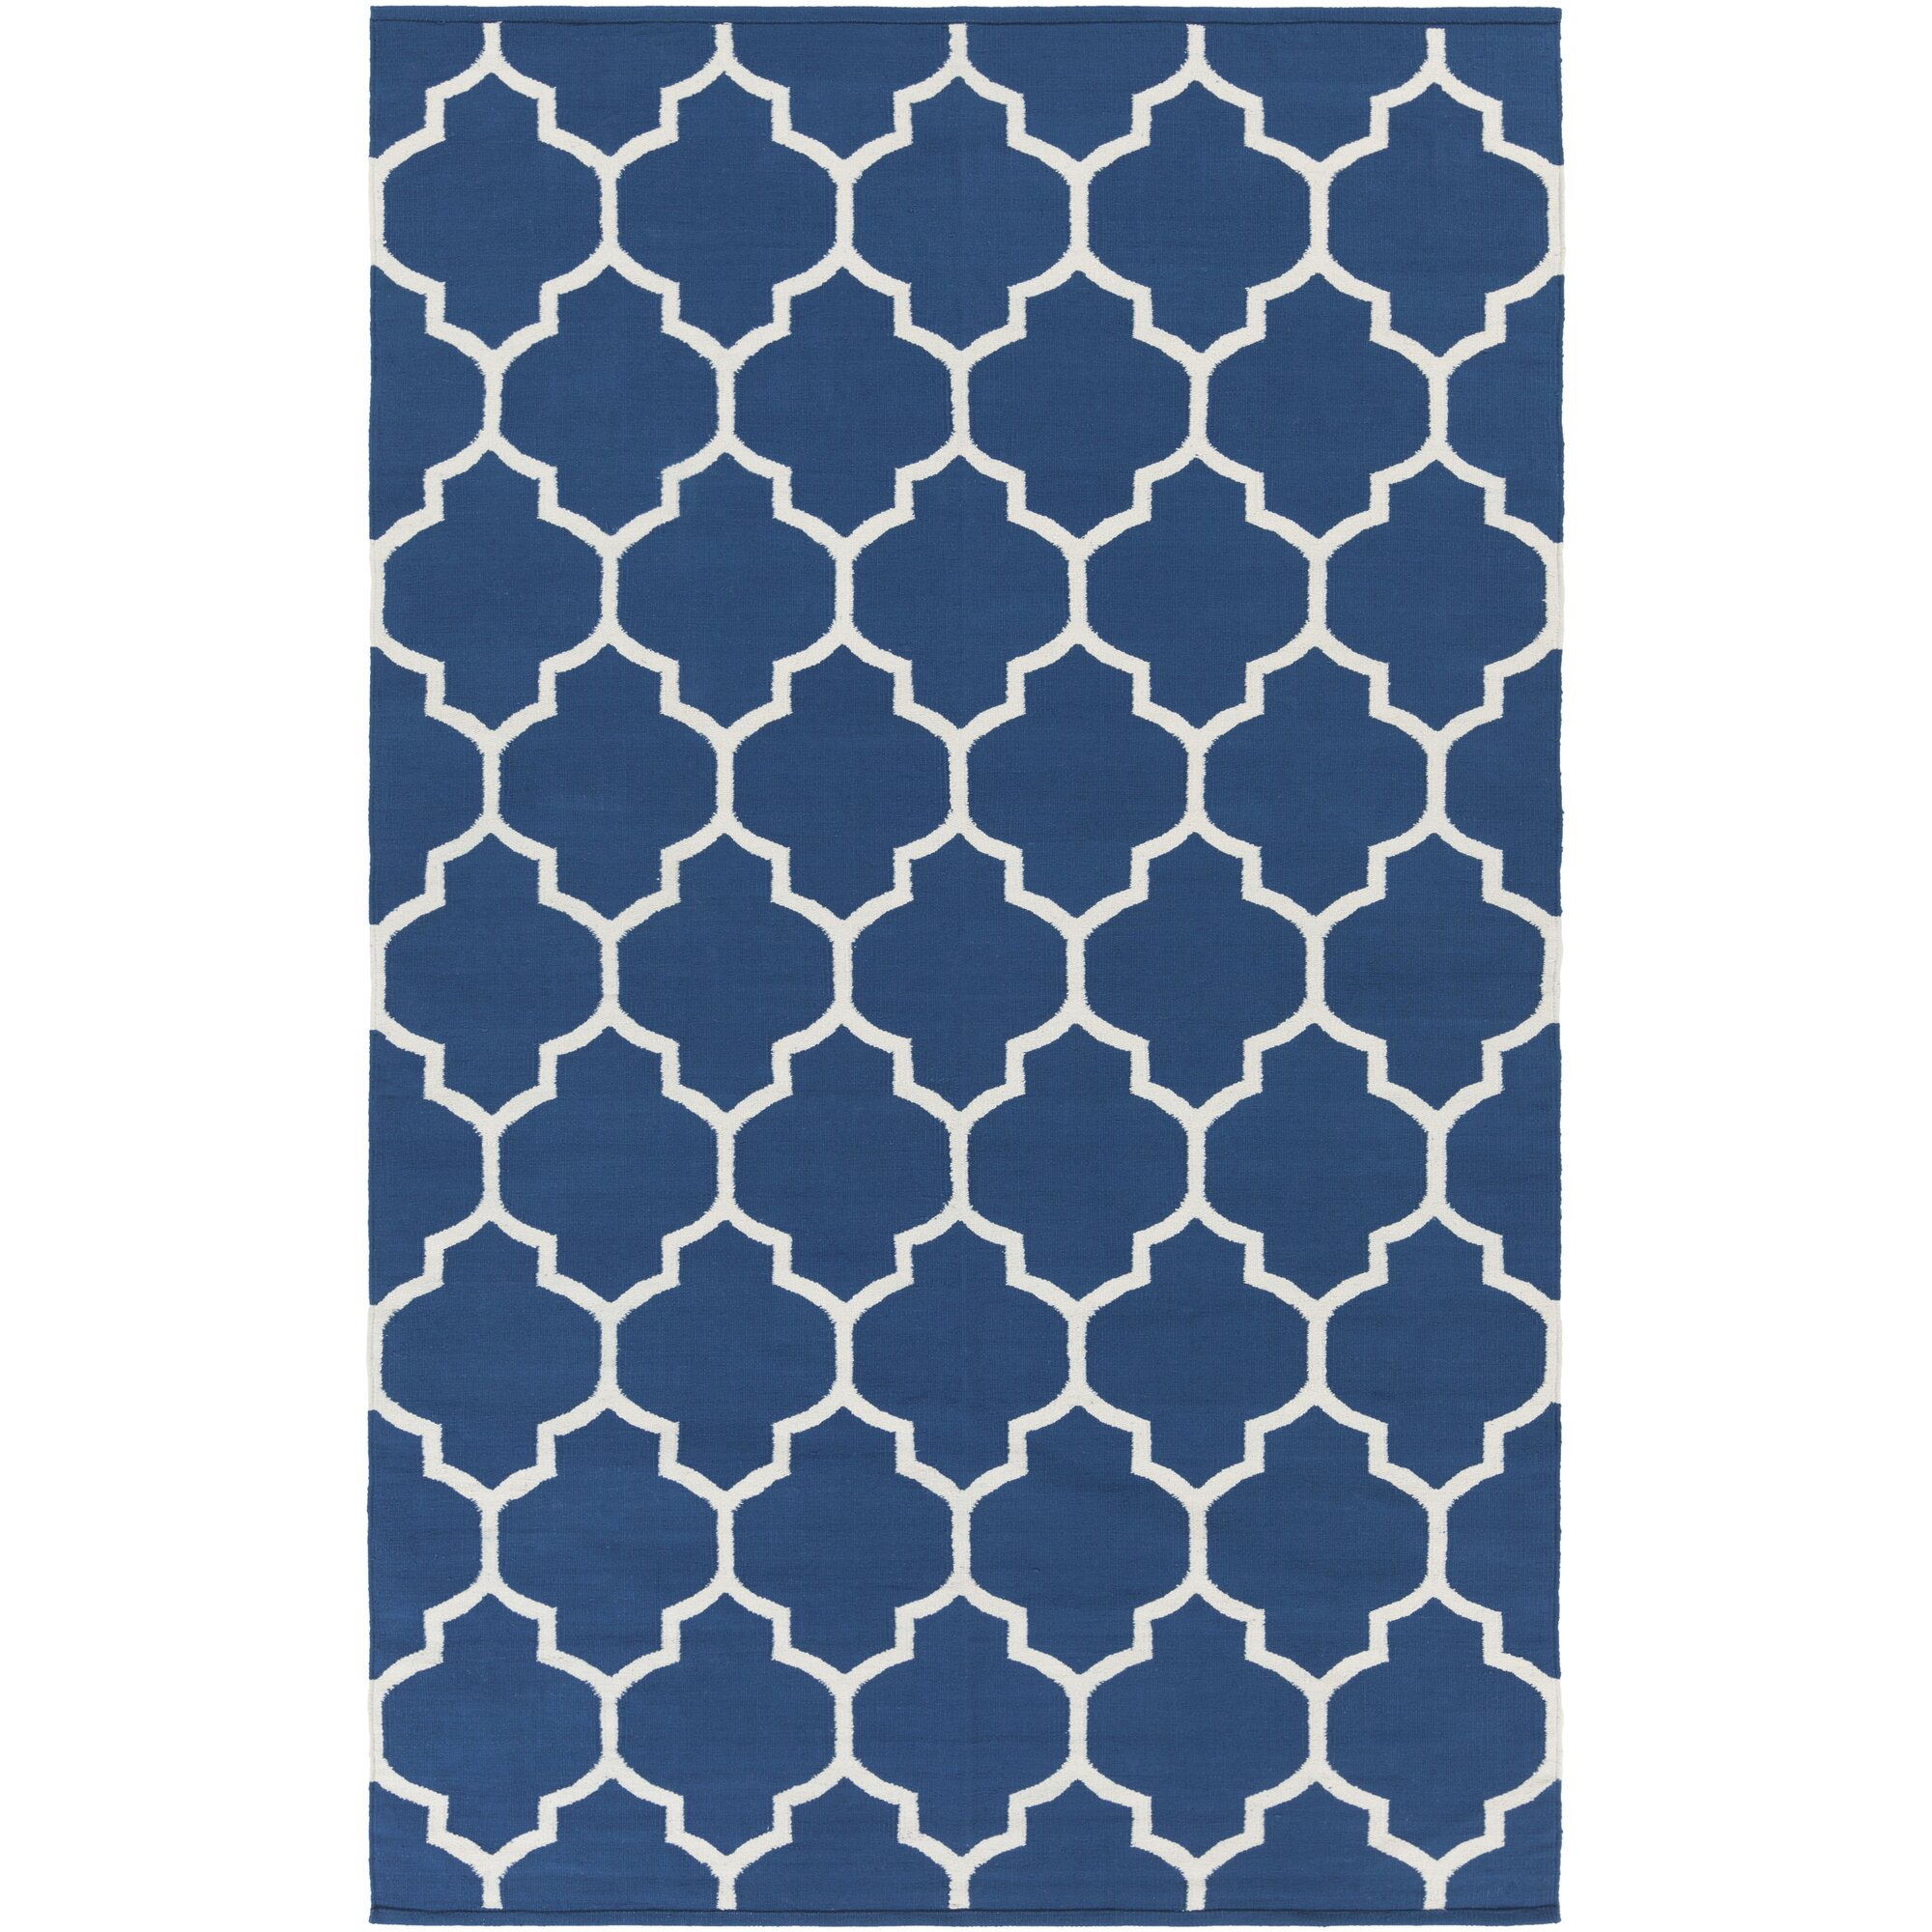 geometric area rugs rugs the home depot geometric rugs free  - artistic weavers vogue blue geometric claire area rug reviews  geometricrug